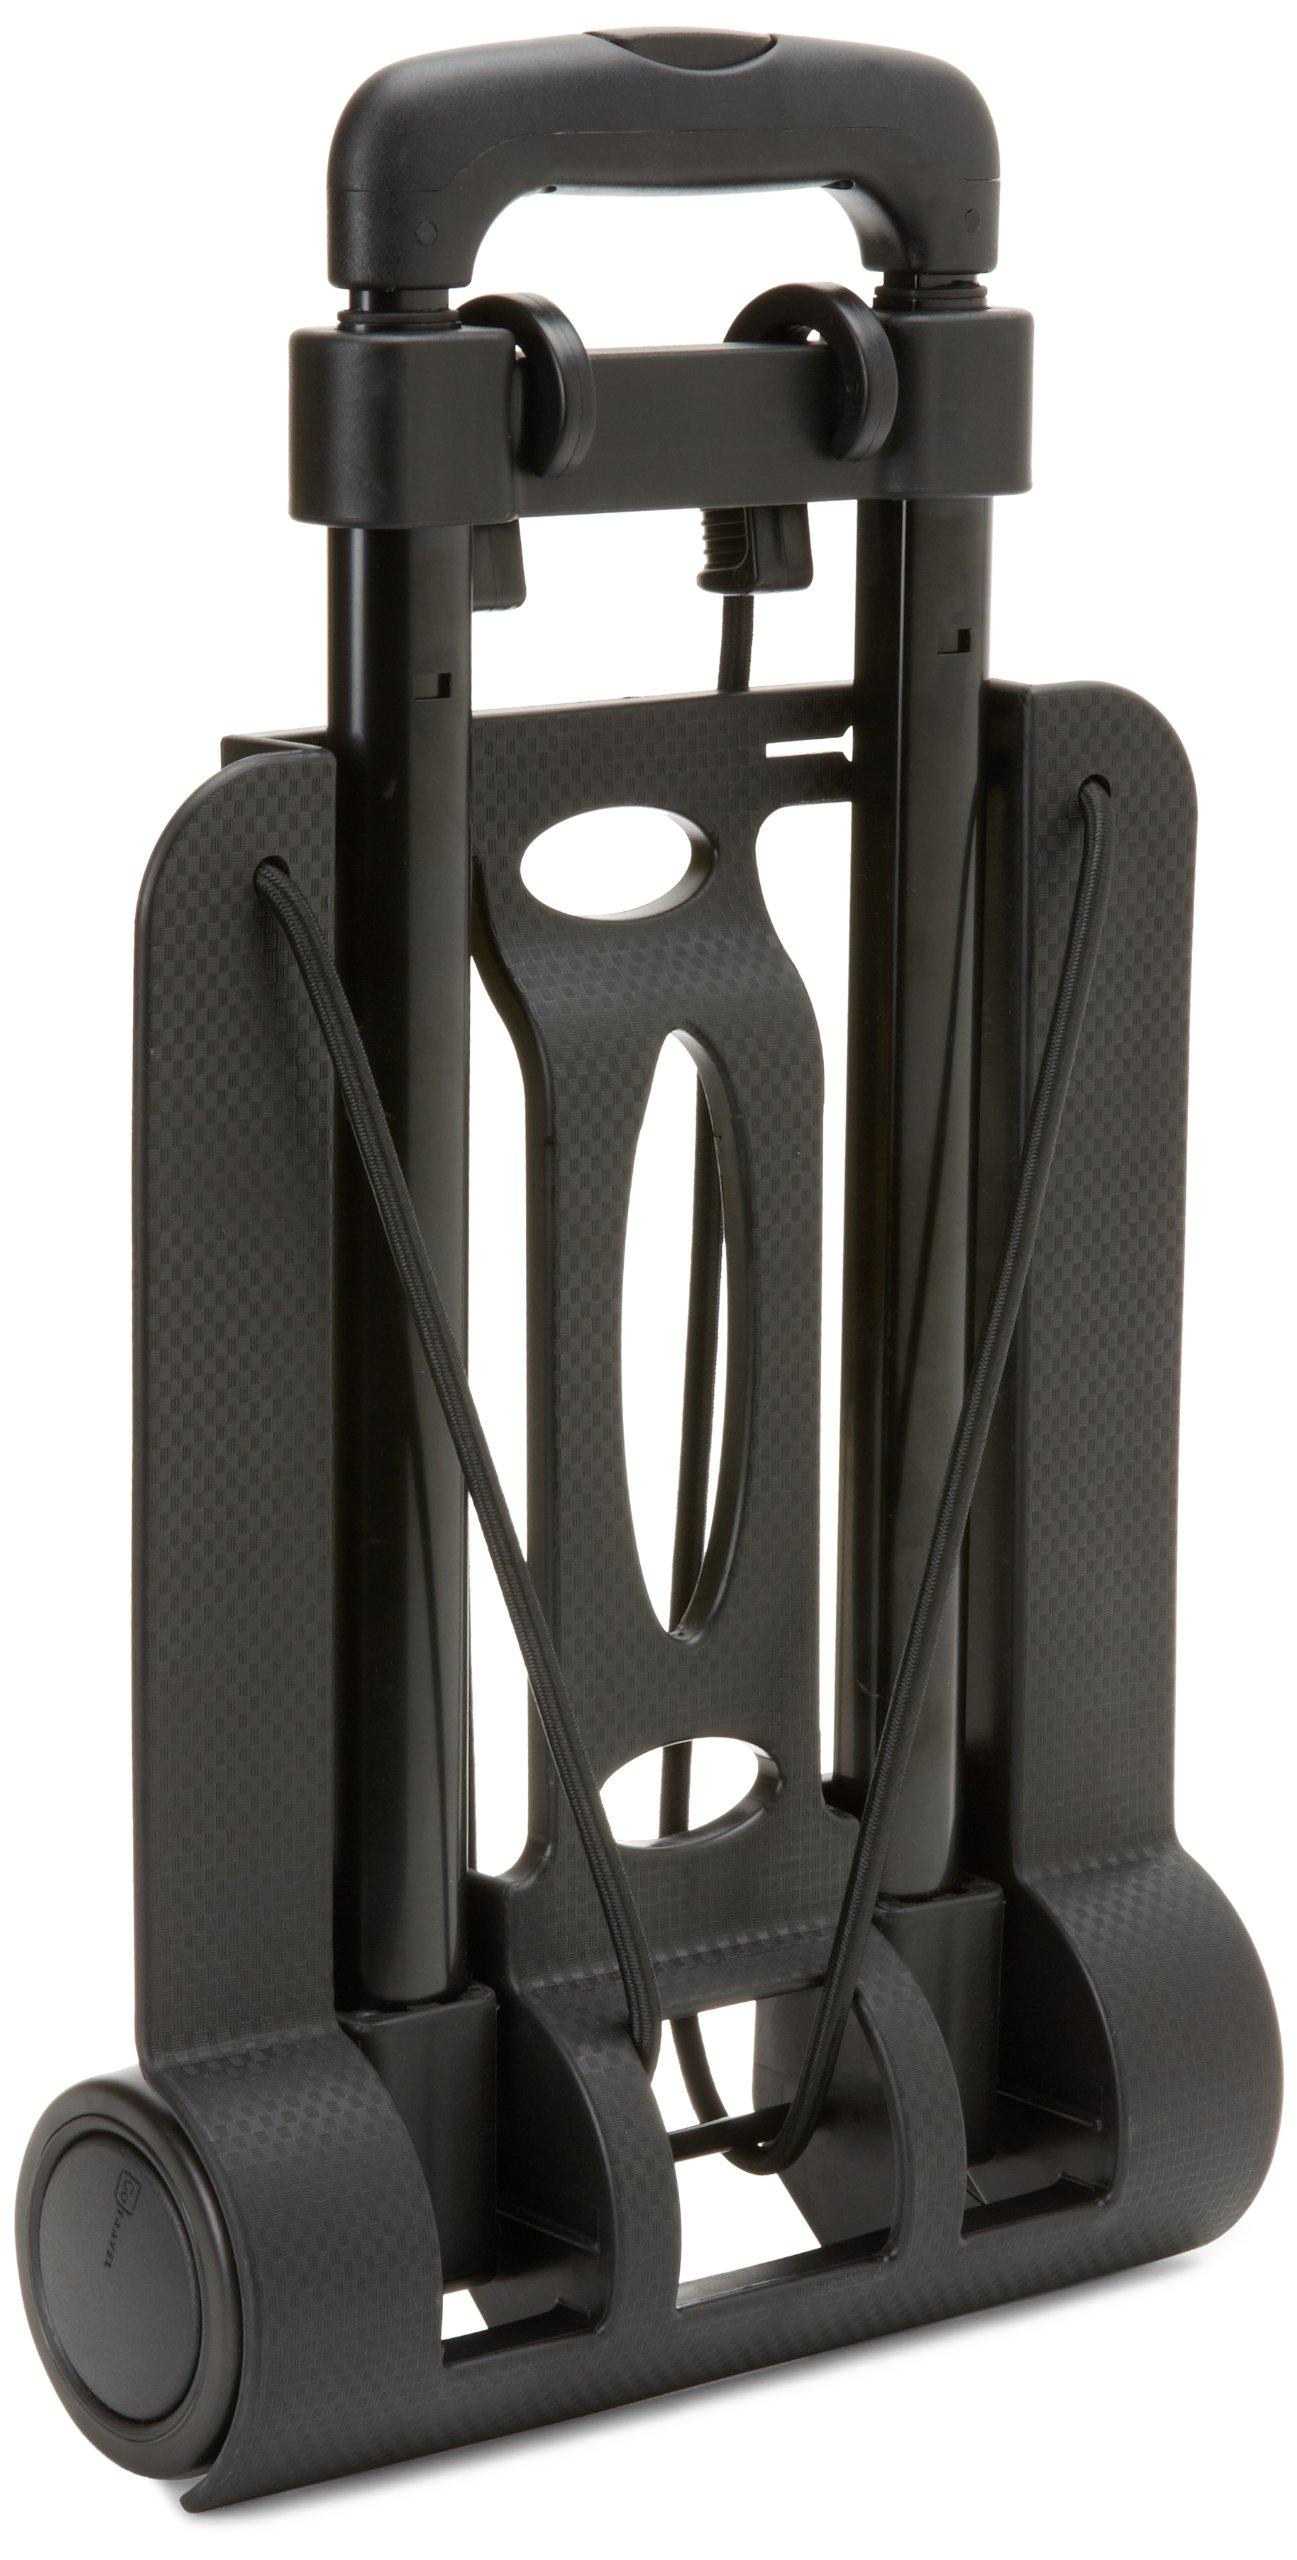 Design Go Luggage Travel Trolley, Black, One Size